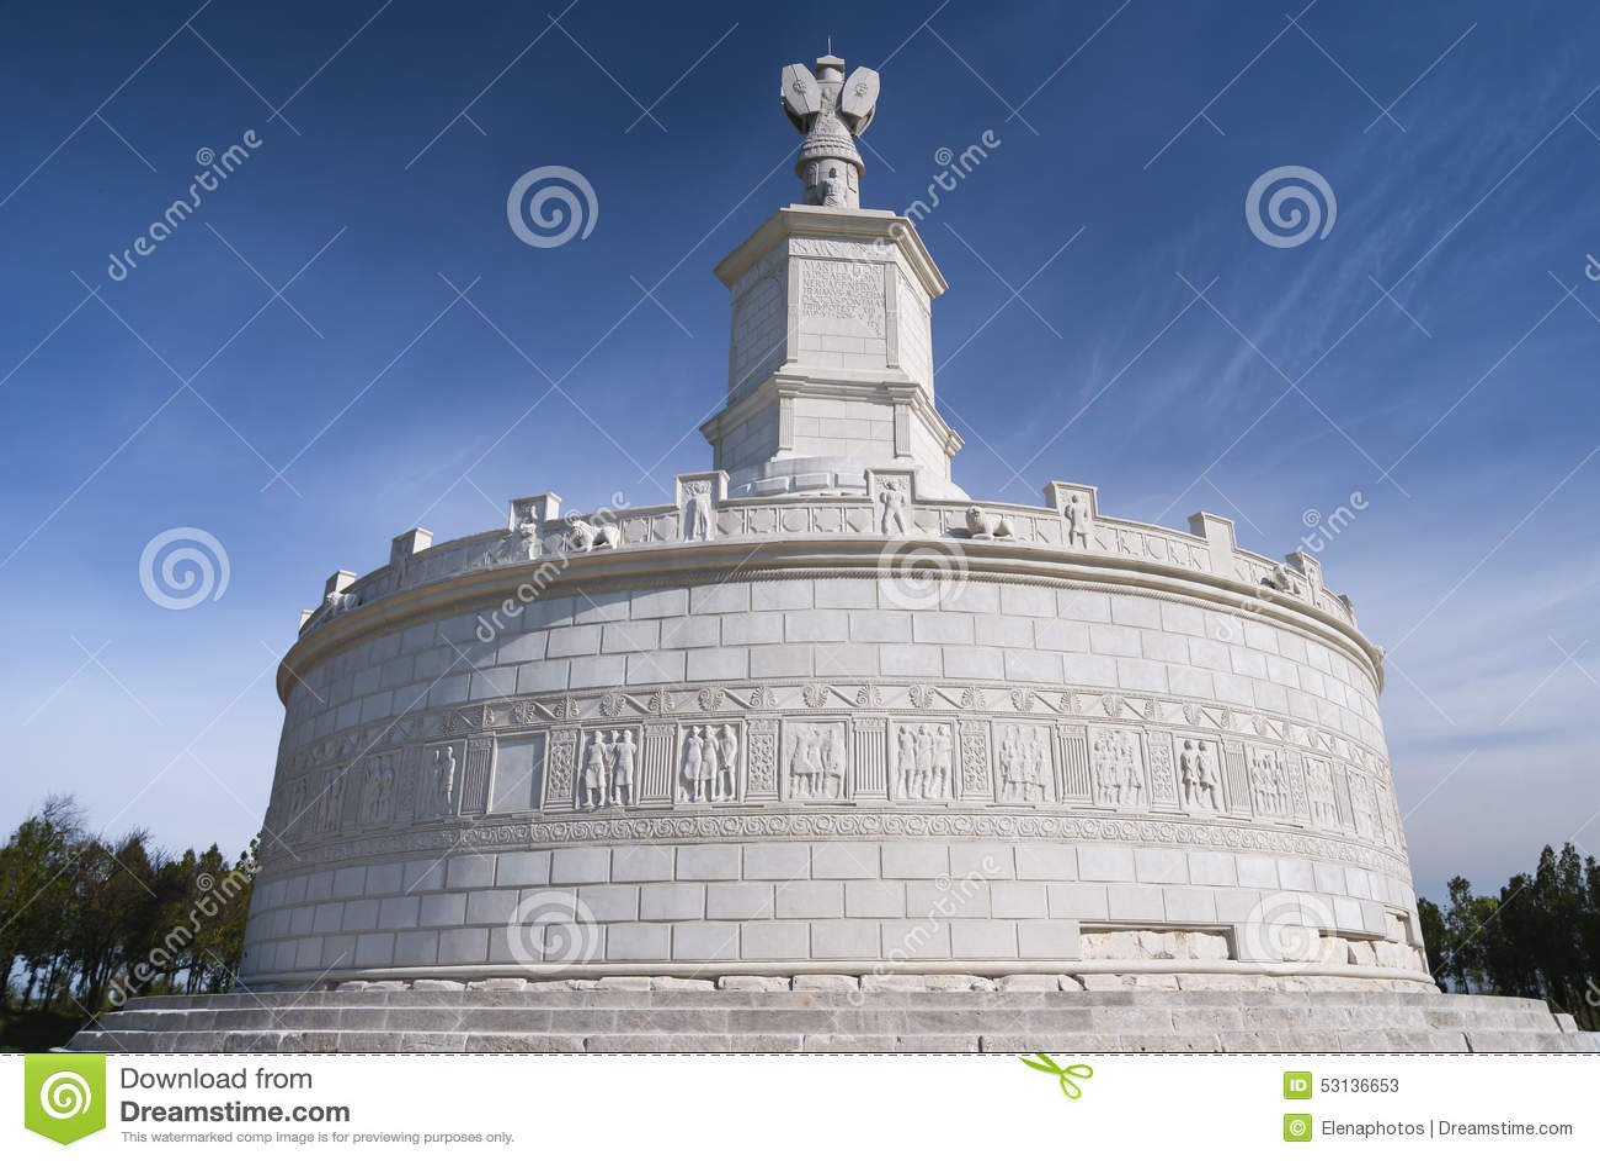 Römisches Monument in Adamclisi, Rumänien